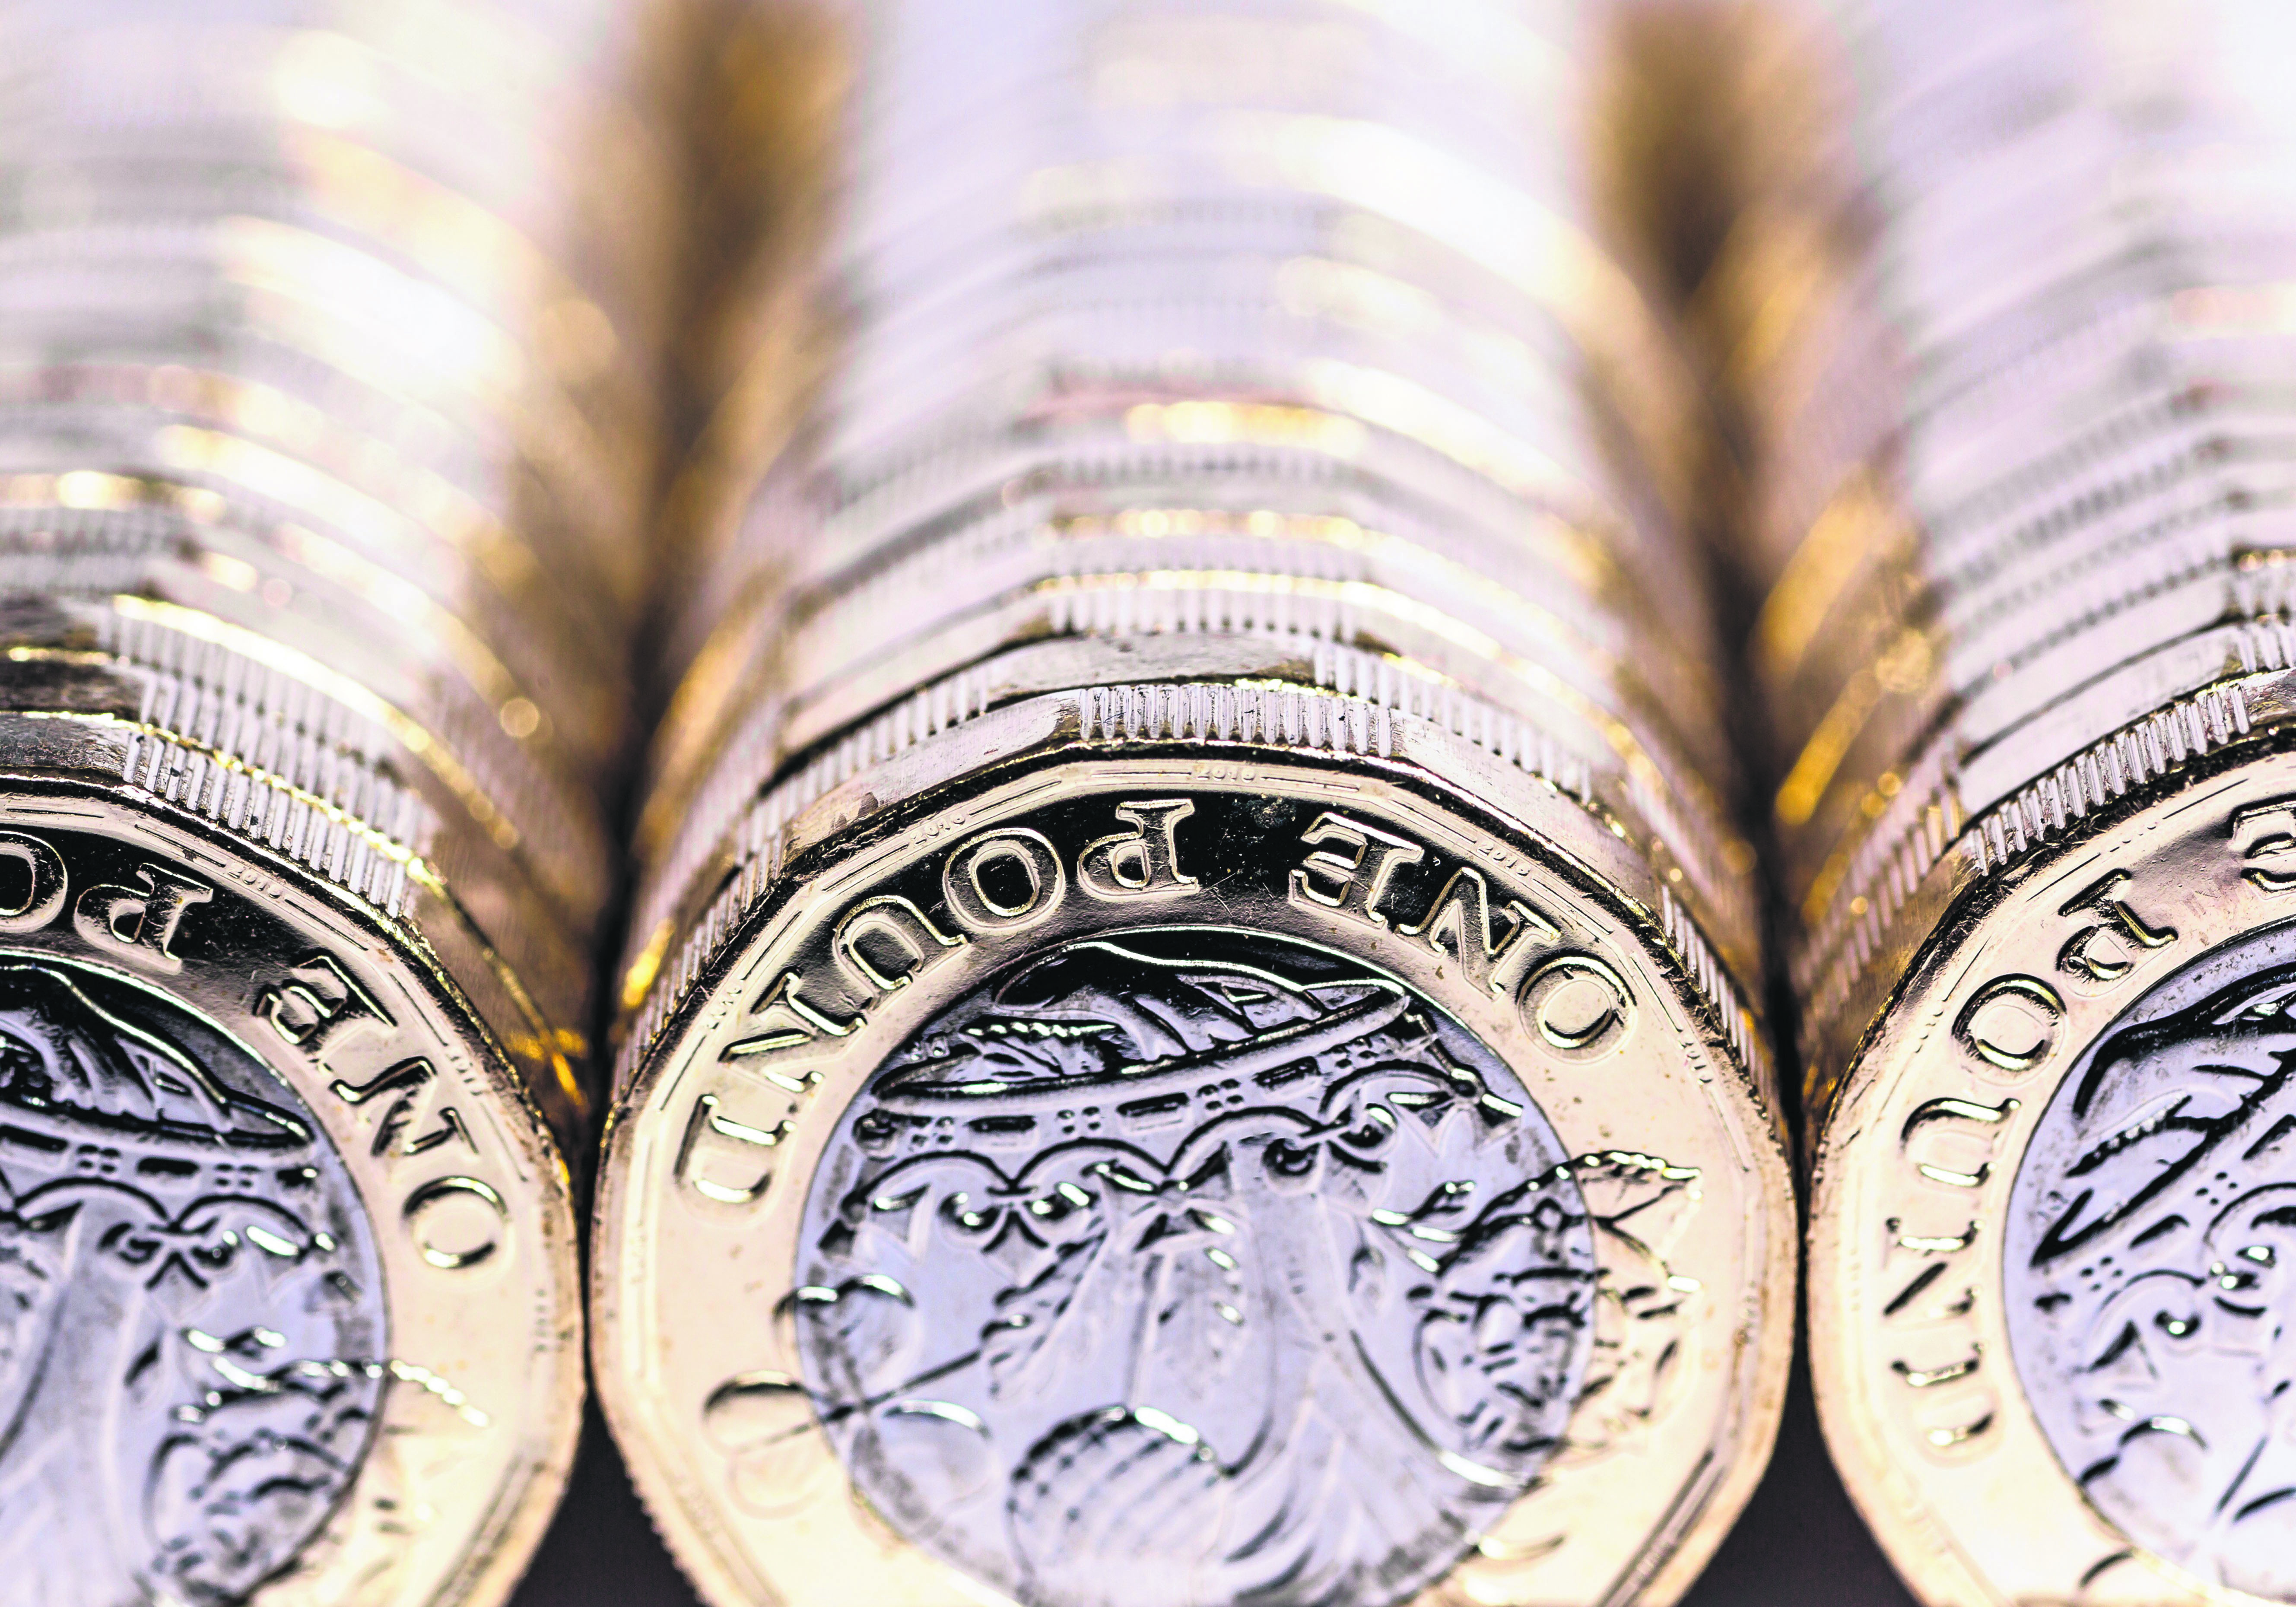 Stubborn Boris could scupper 2020 GBP recovery - CityAM